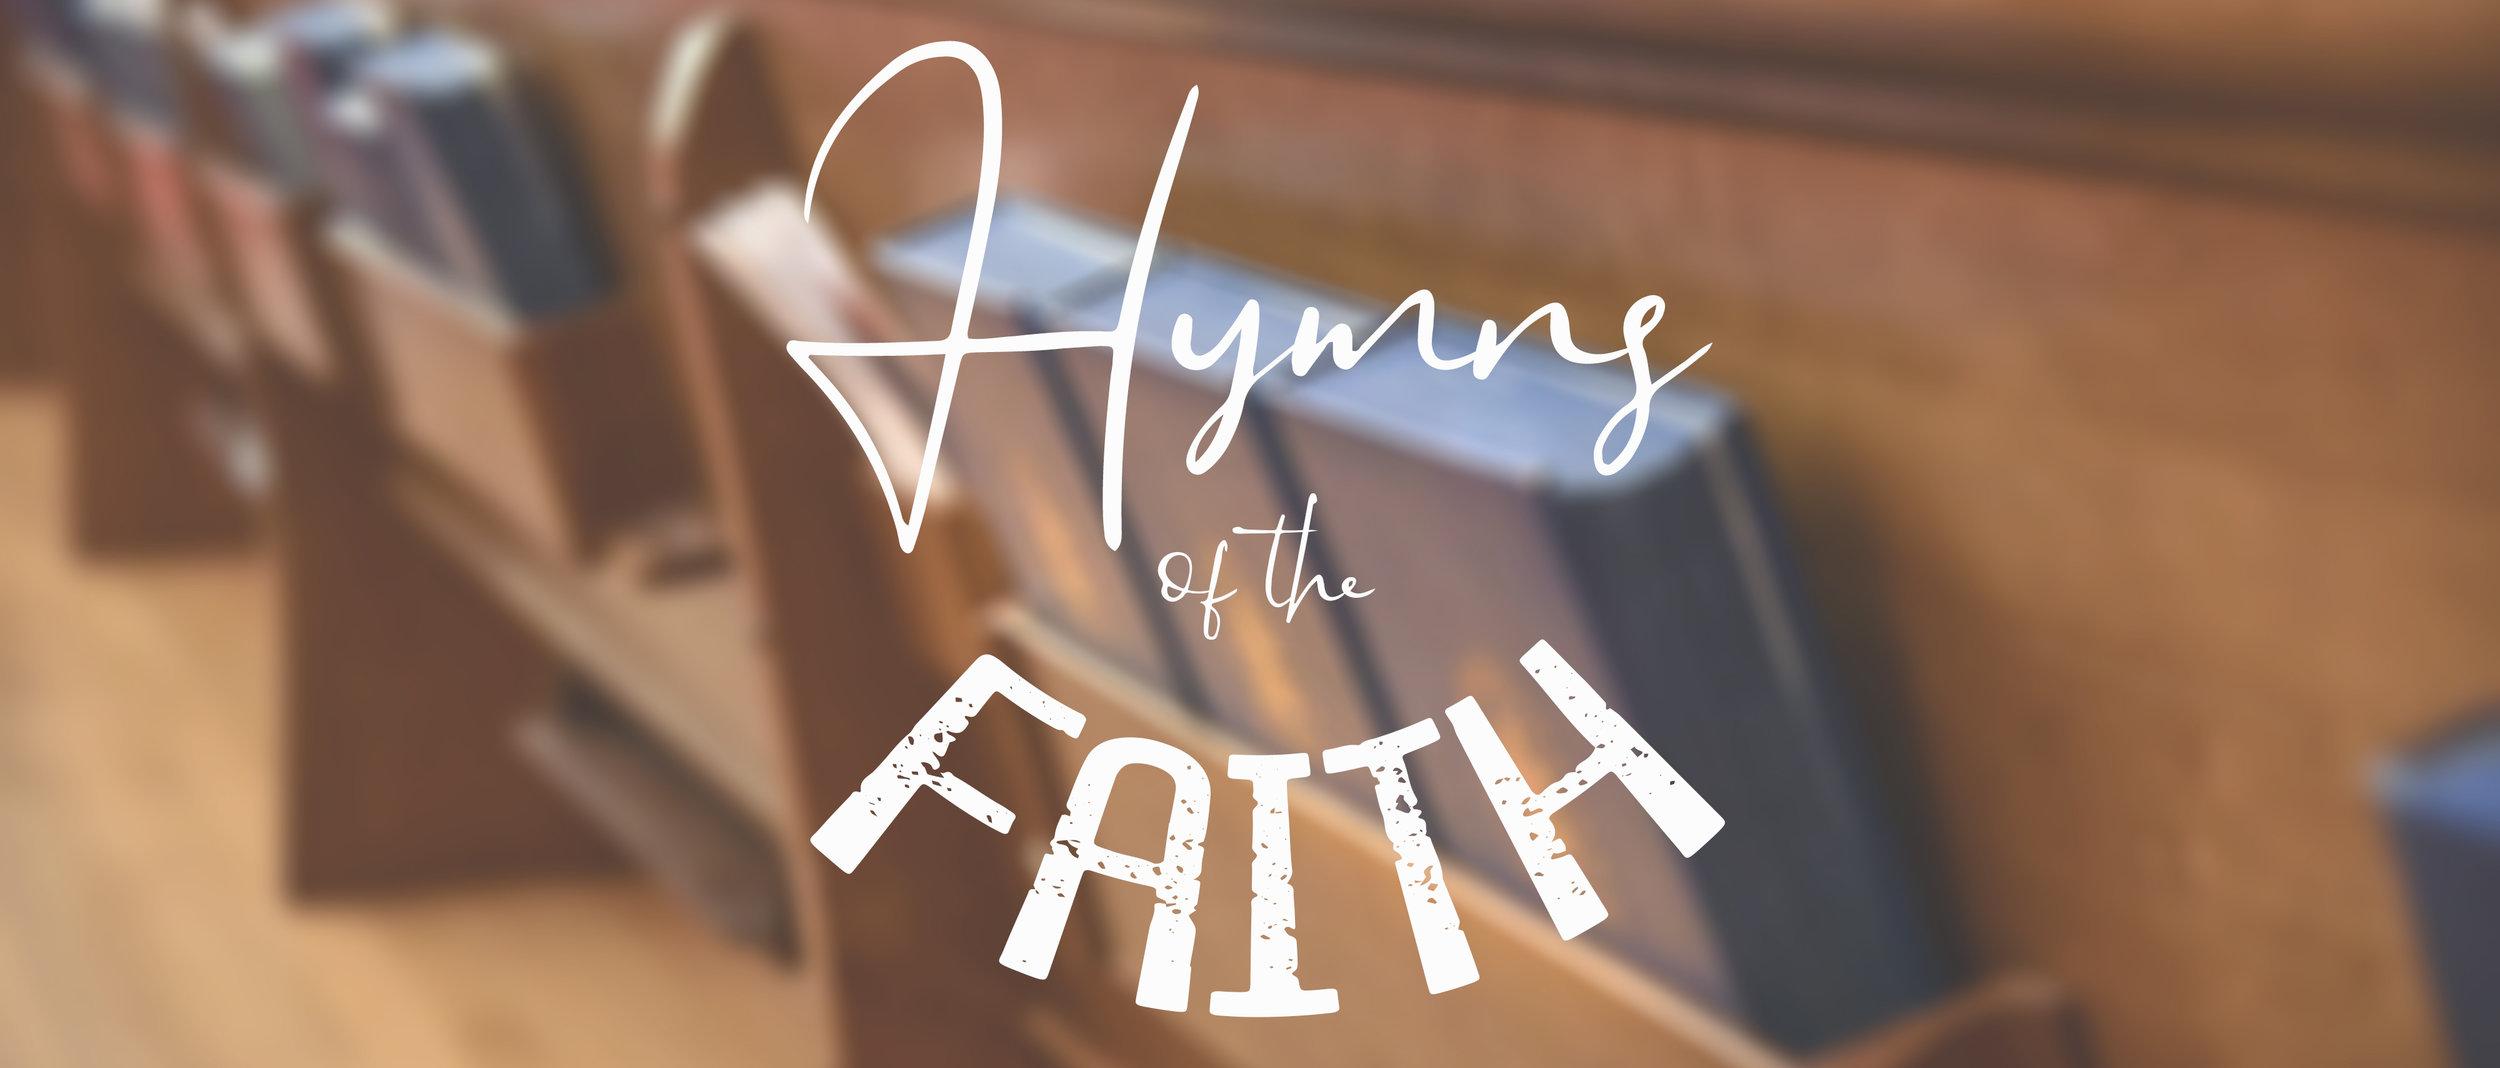 hymns2.jpg